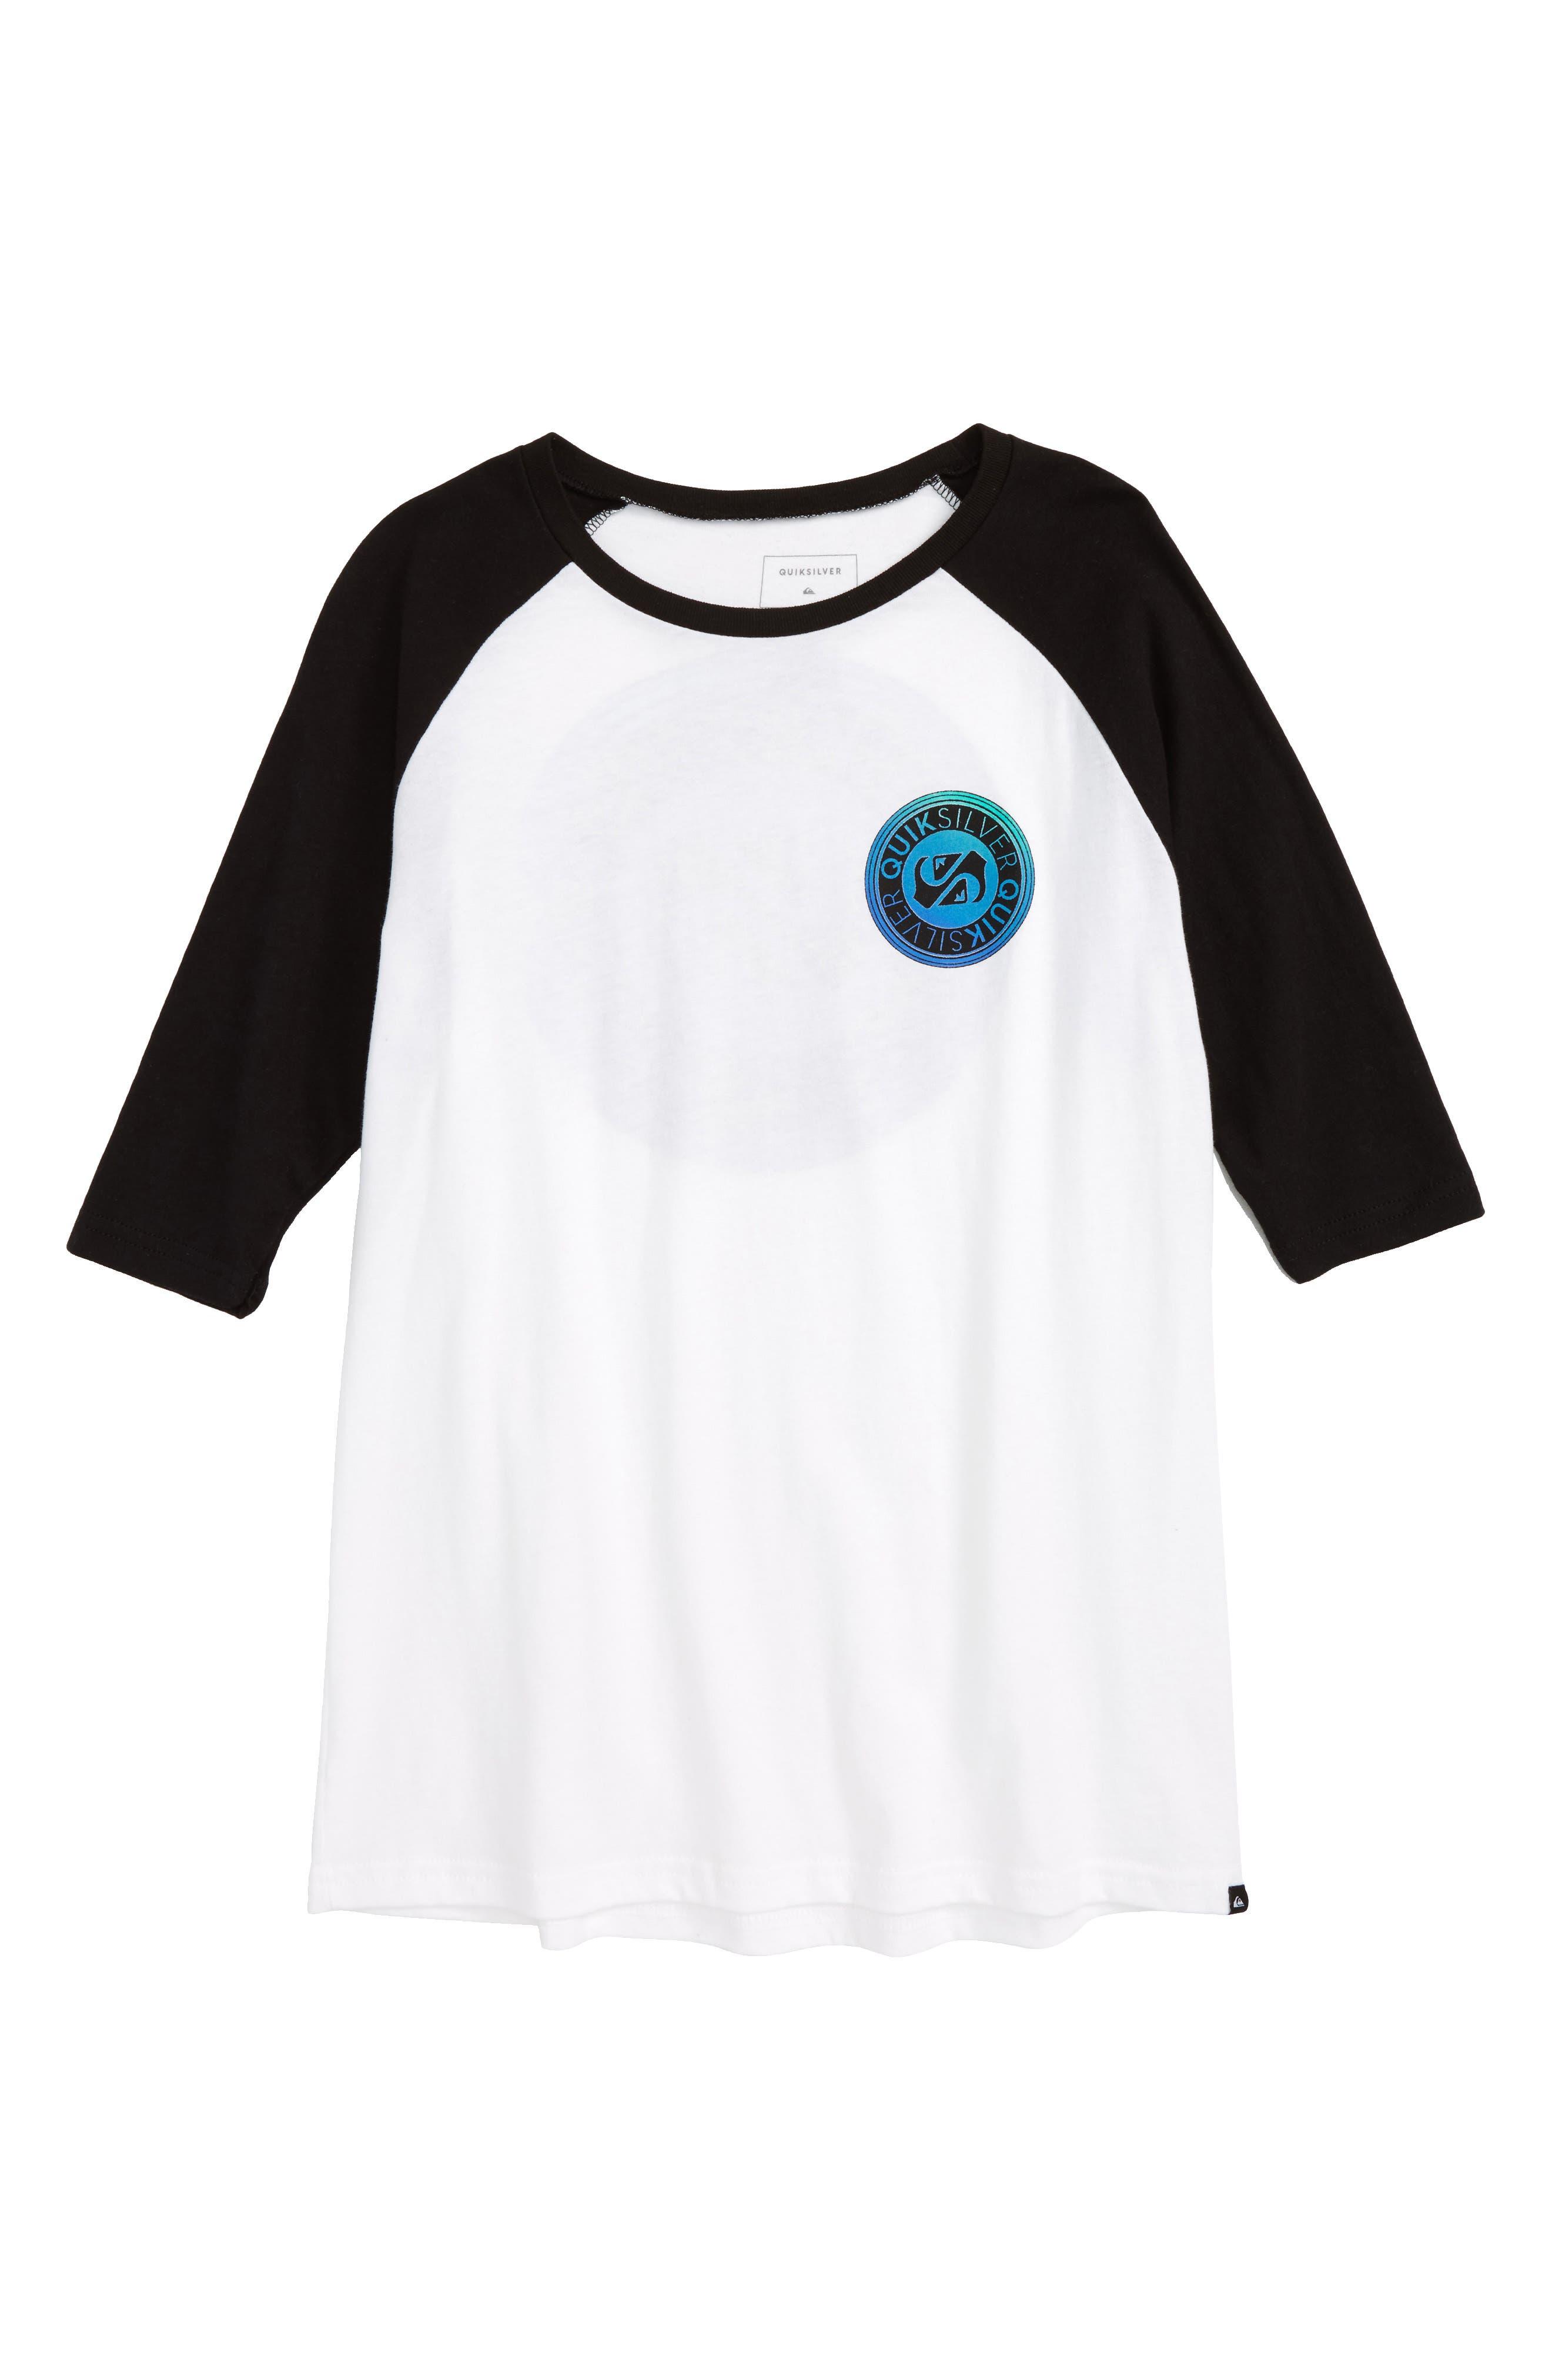 Alternate Image 1 Selected - Quiksilver International Raglan T-Shirt (Big Boys)